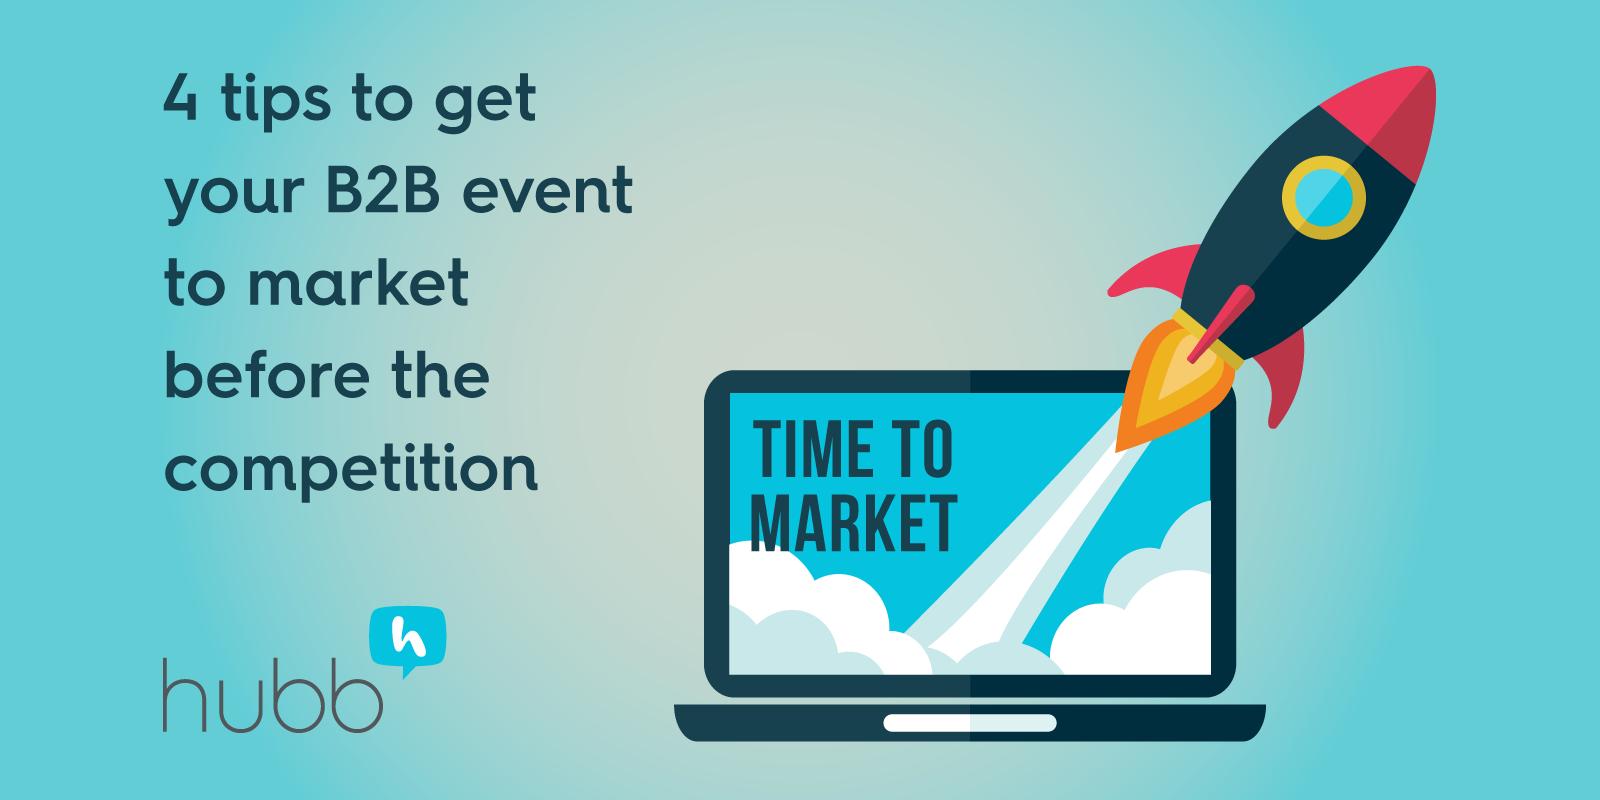 4Tips-B2B-Event-to-Market-Social